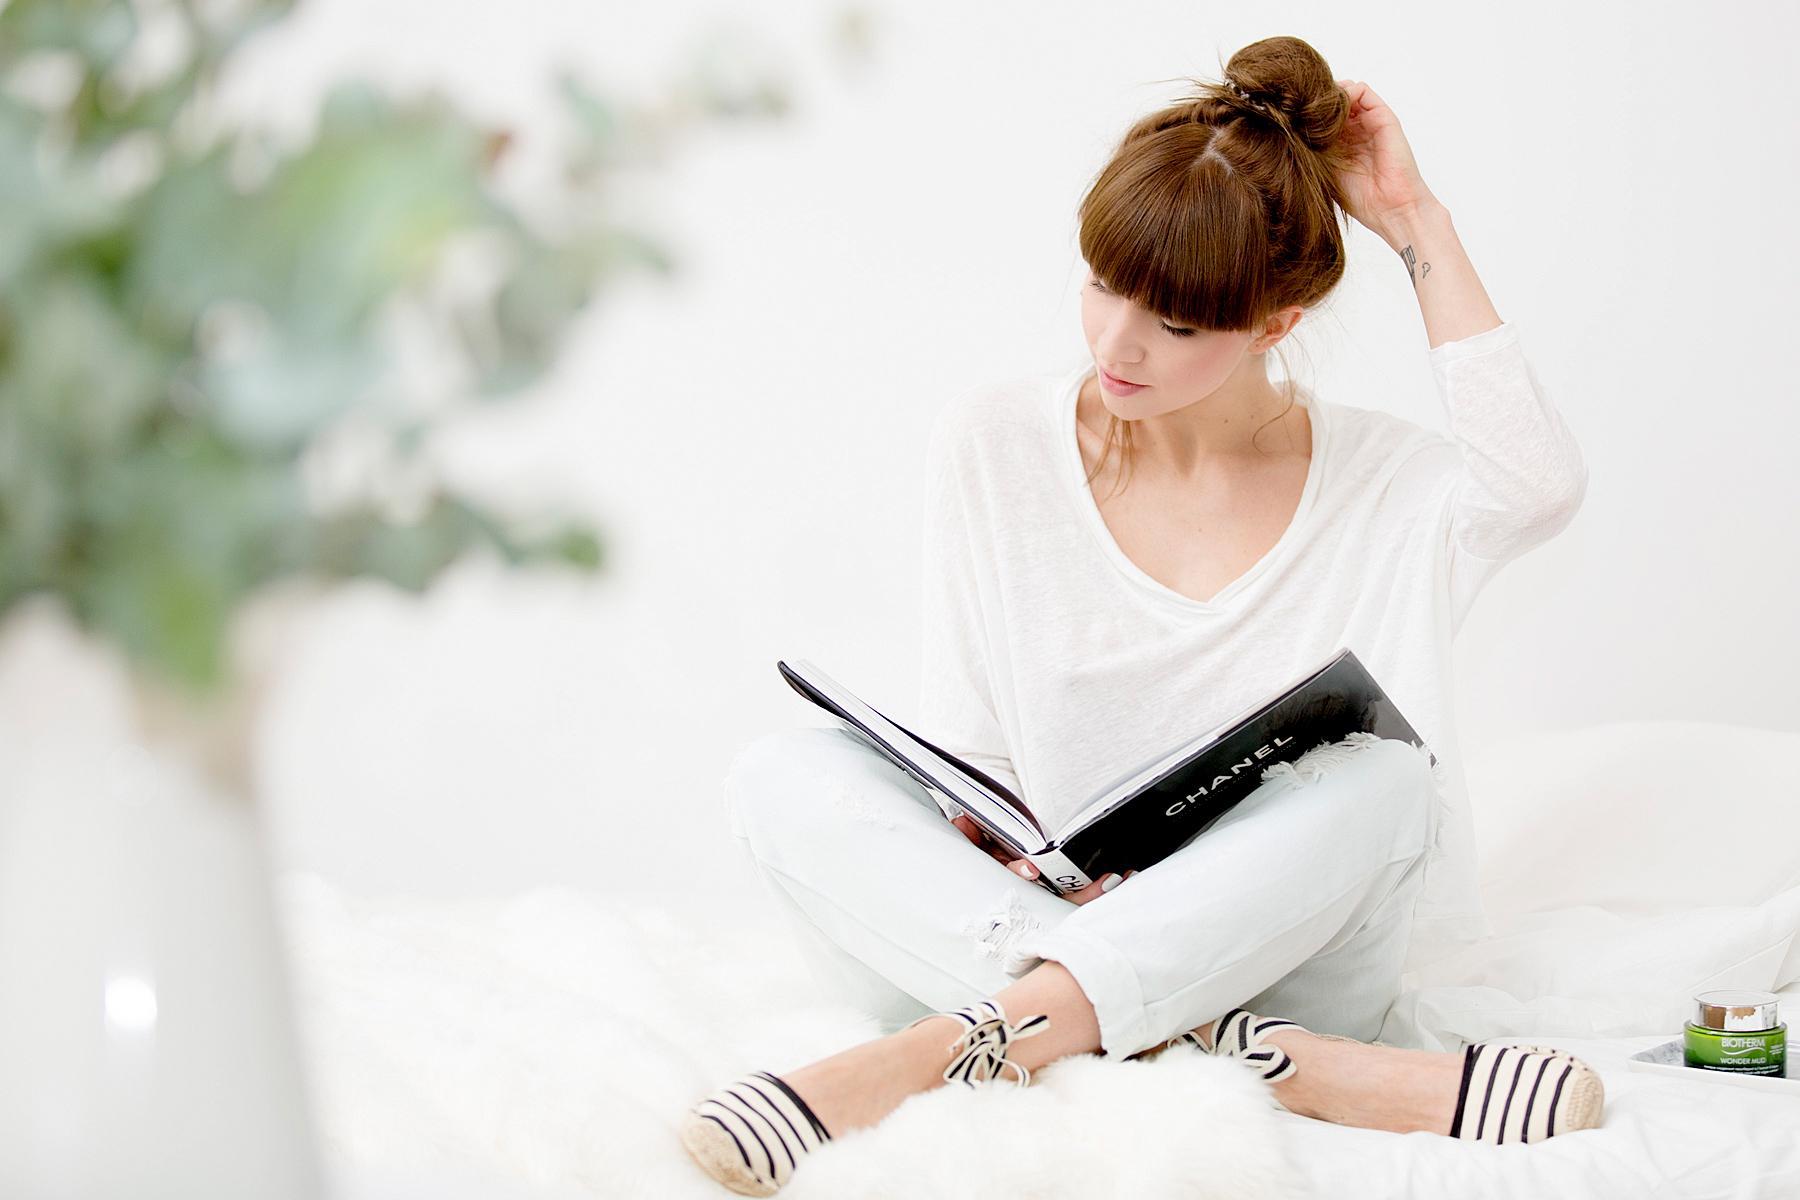 soludos striped espadrilles chanel book camelia reading relax clean white bright girl brunette bangs cats & dogs blog ricarda schernus fashionblogger düsseldorf germany berlin 4